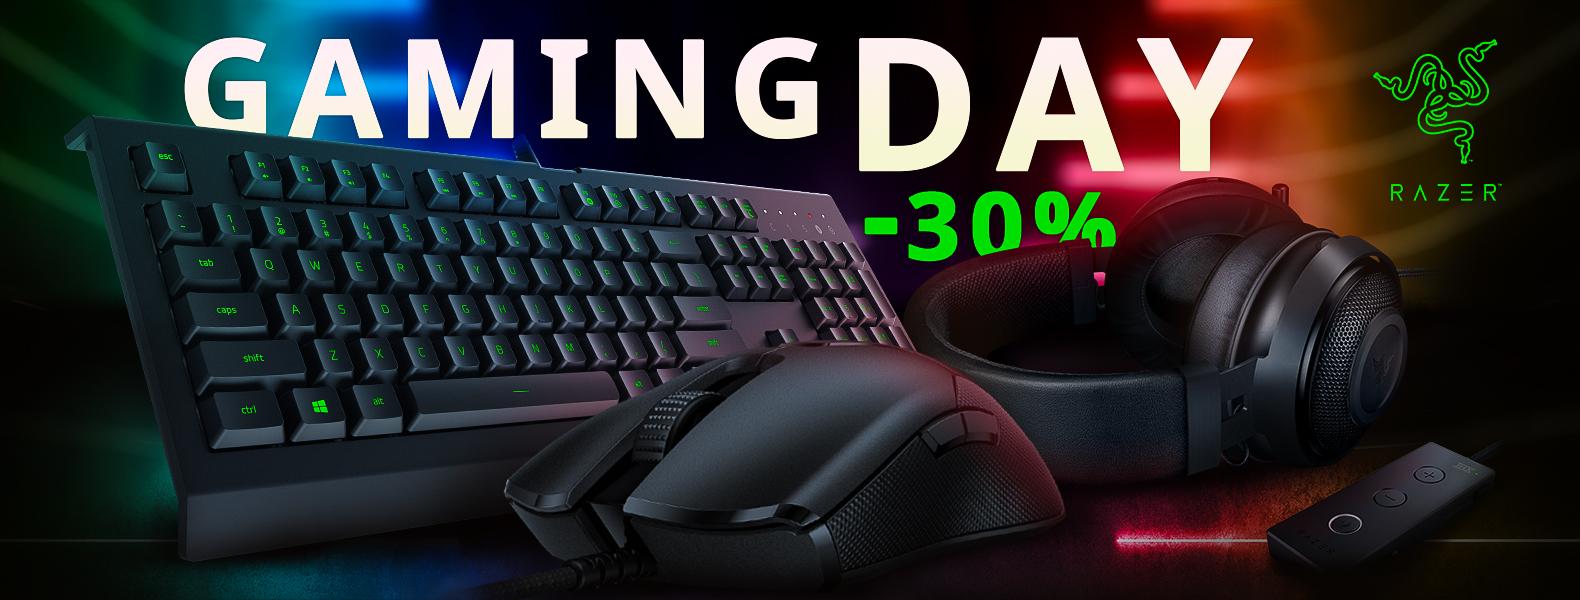 Gaming Day by RAZER